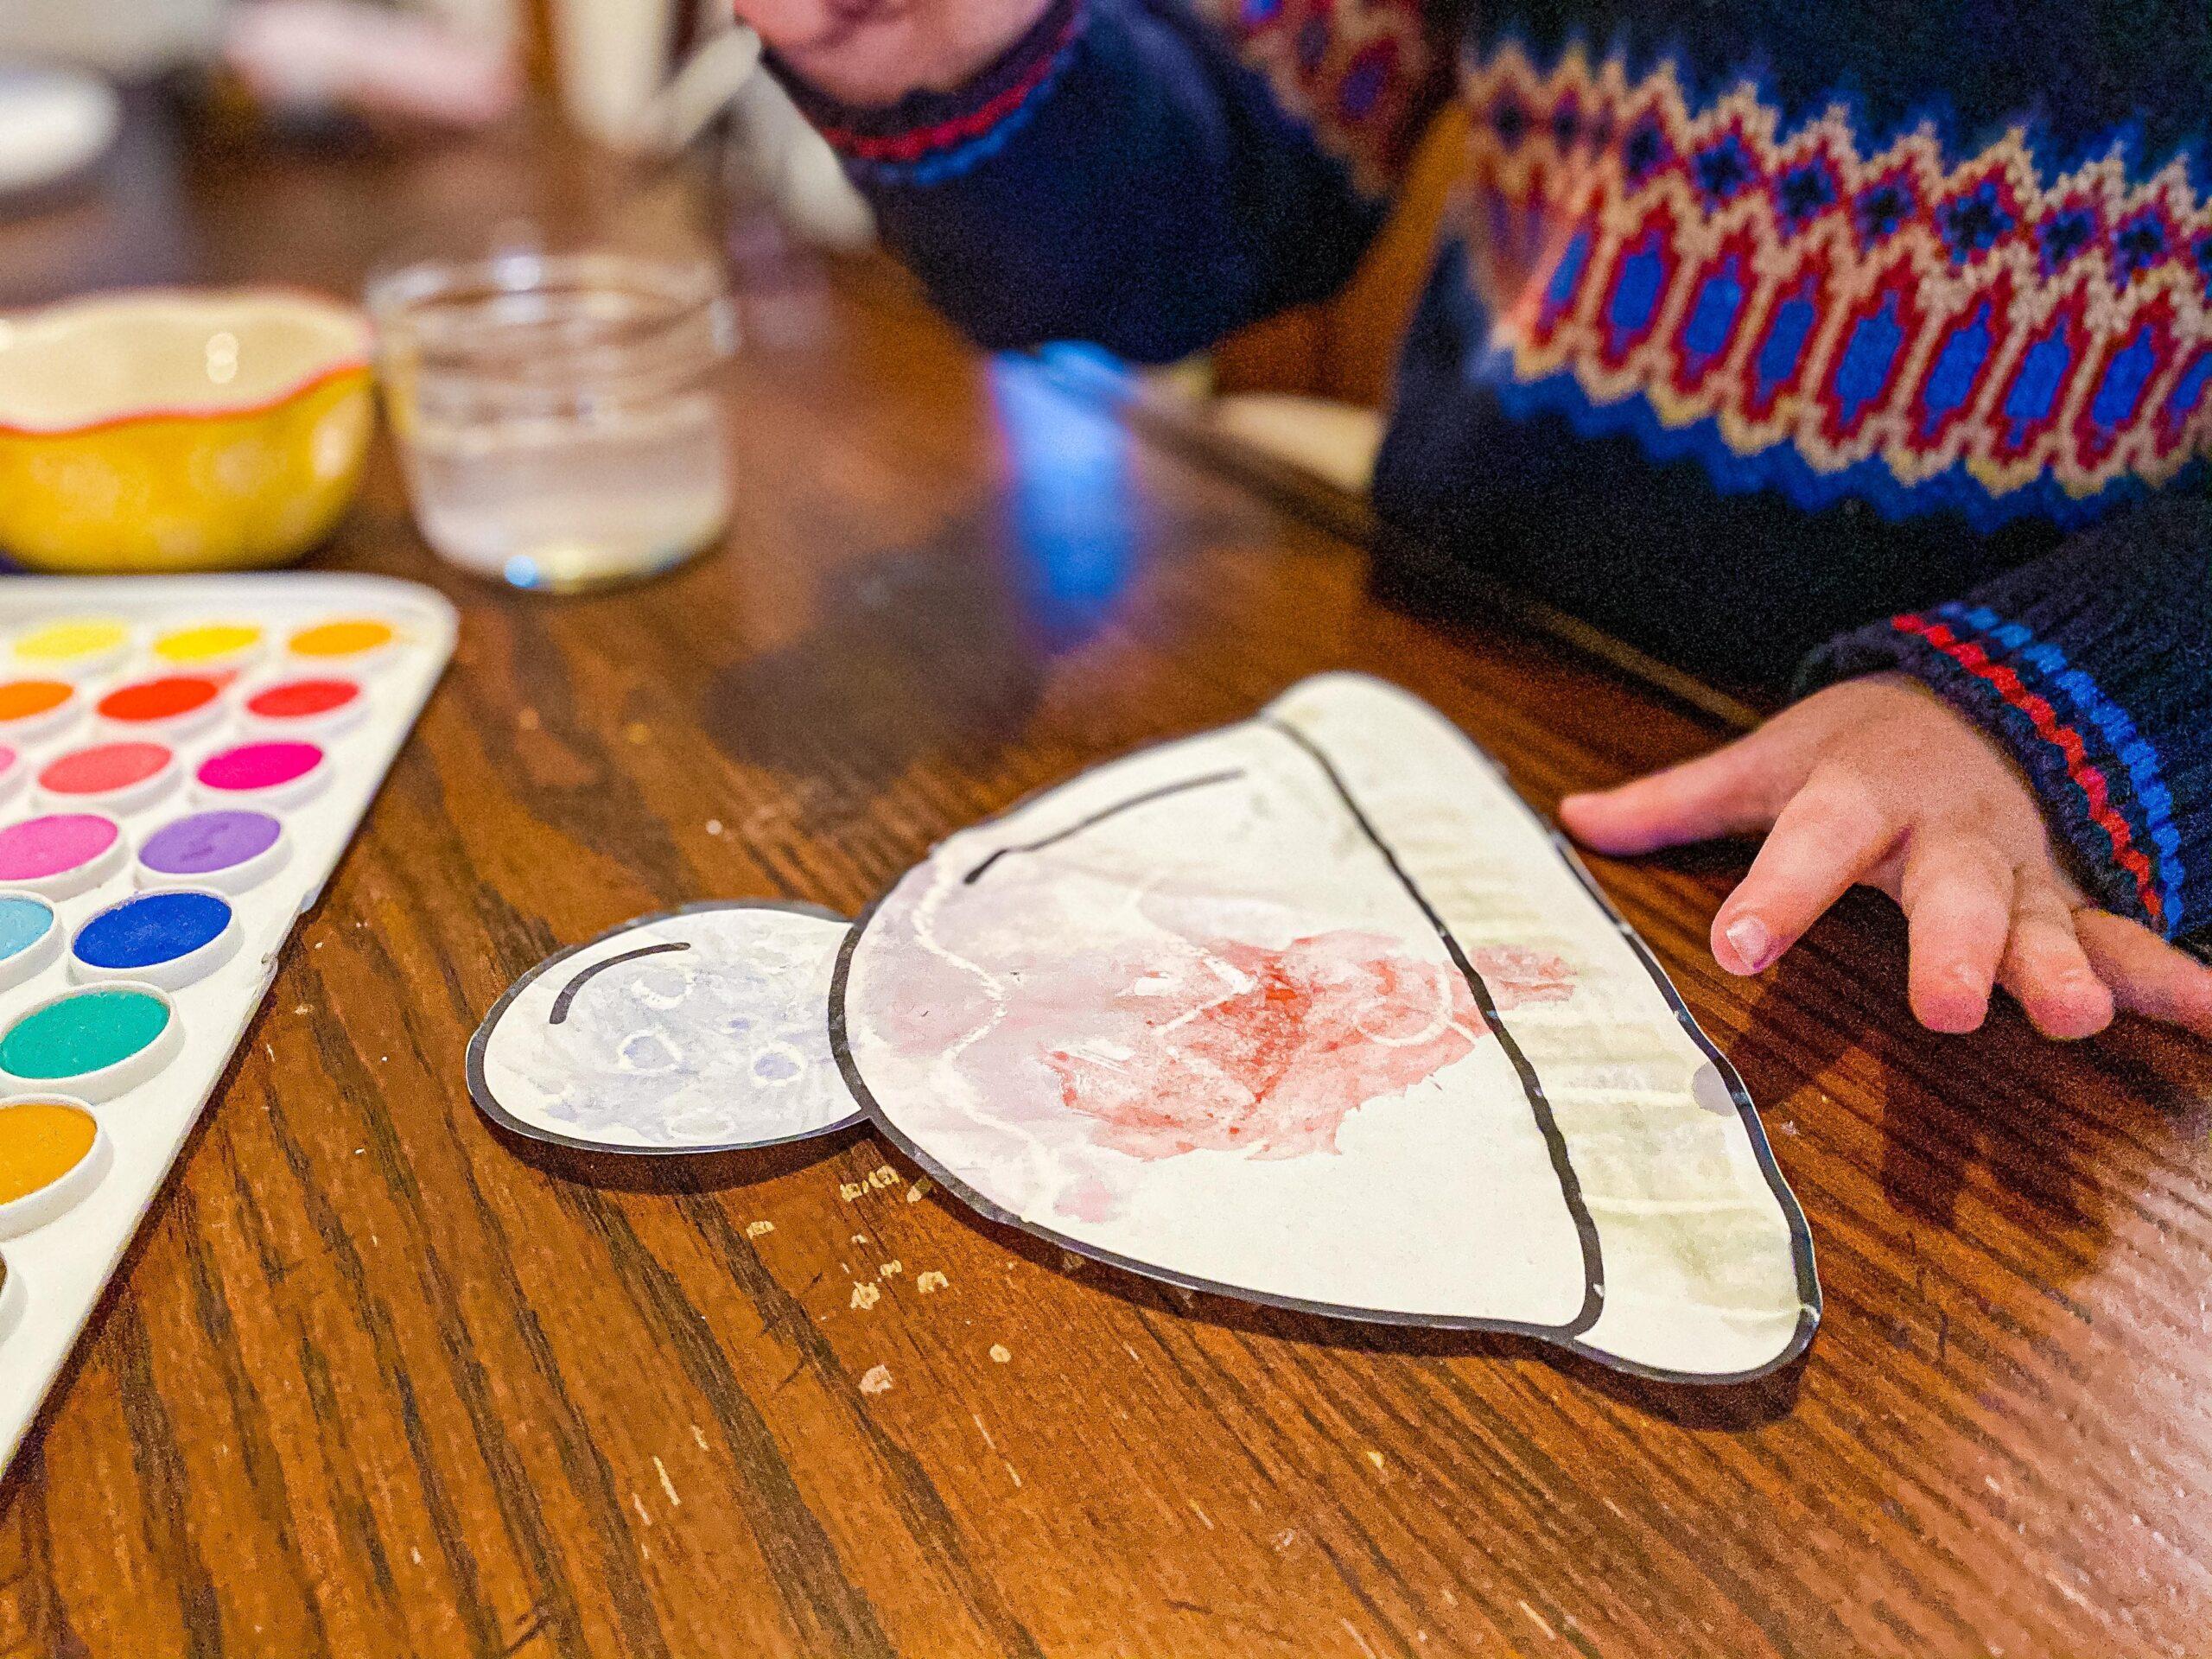 Winter Hat Craft for Preschoolers | Magic Crayon Resist Art Project